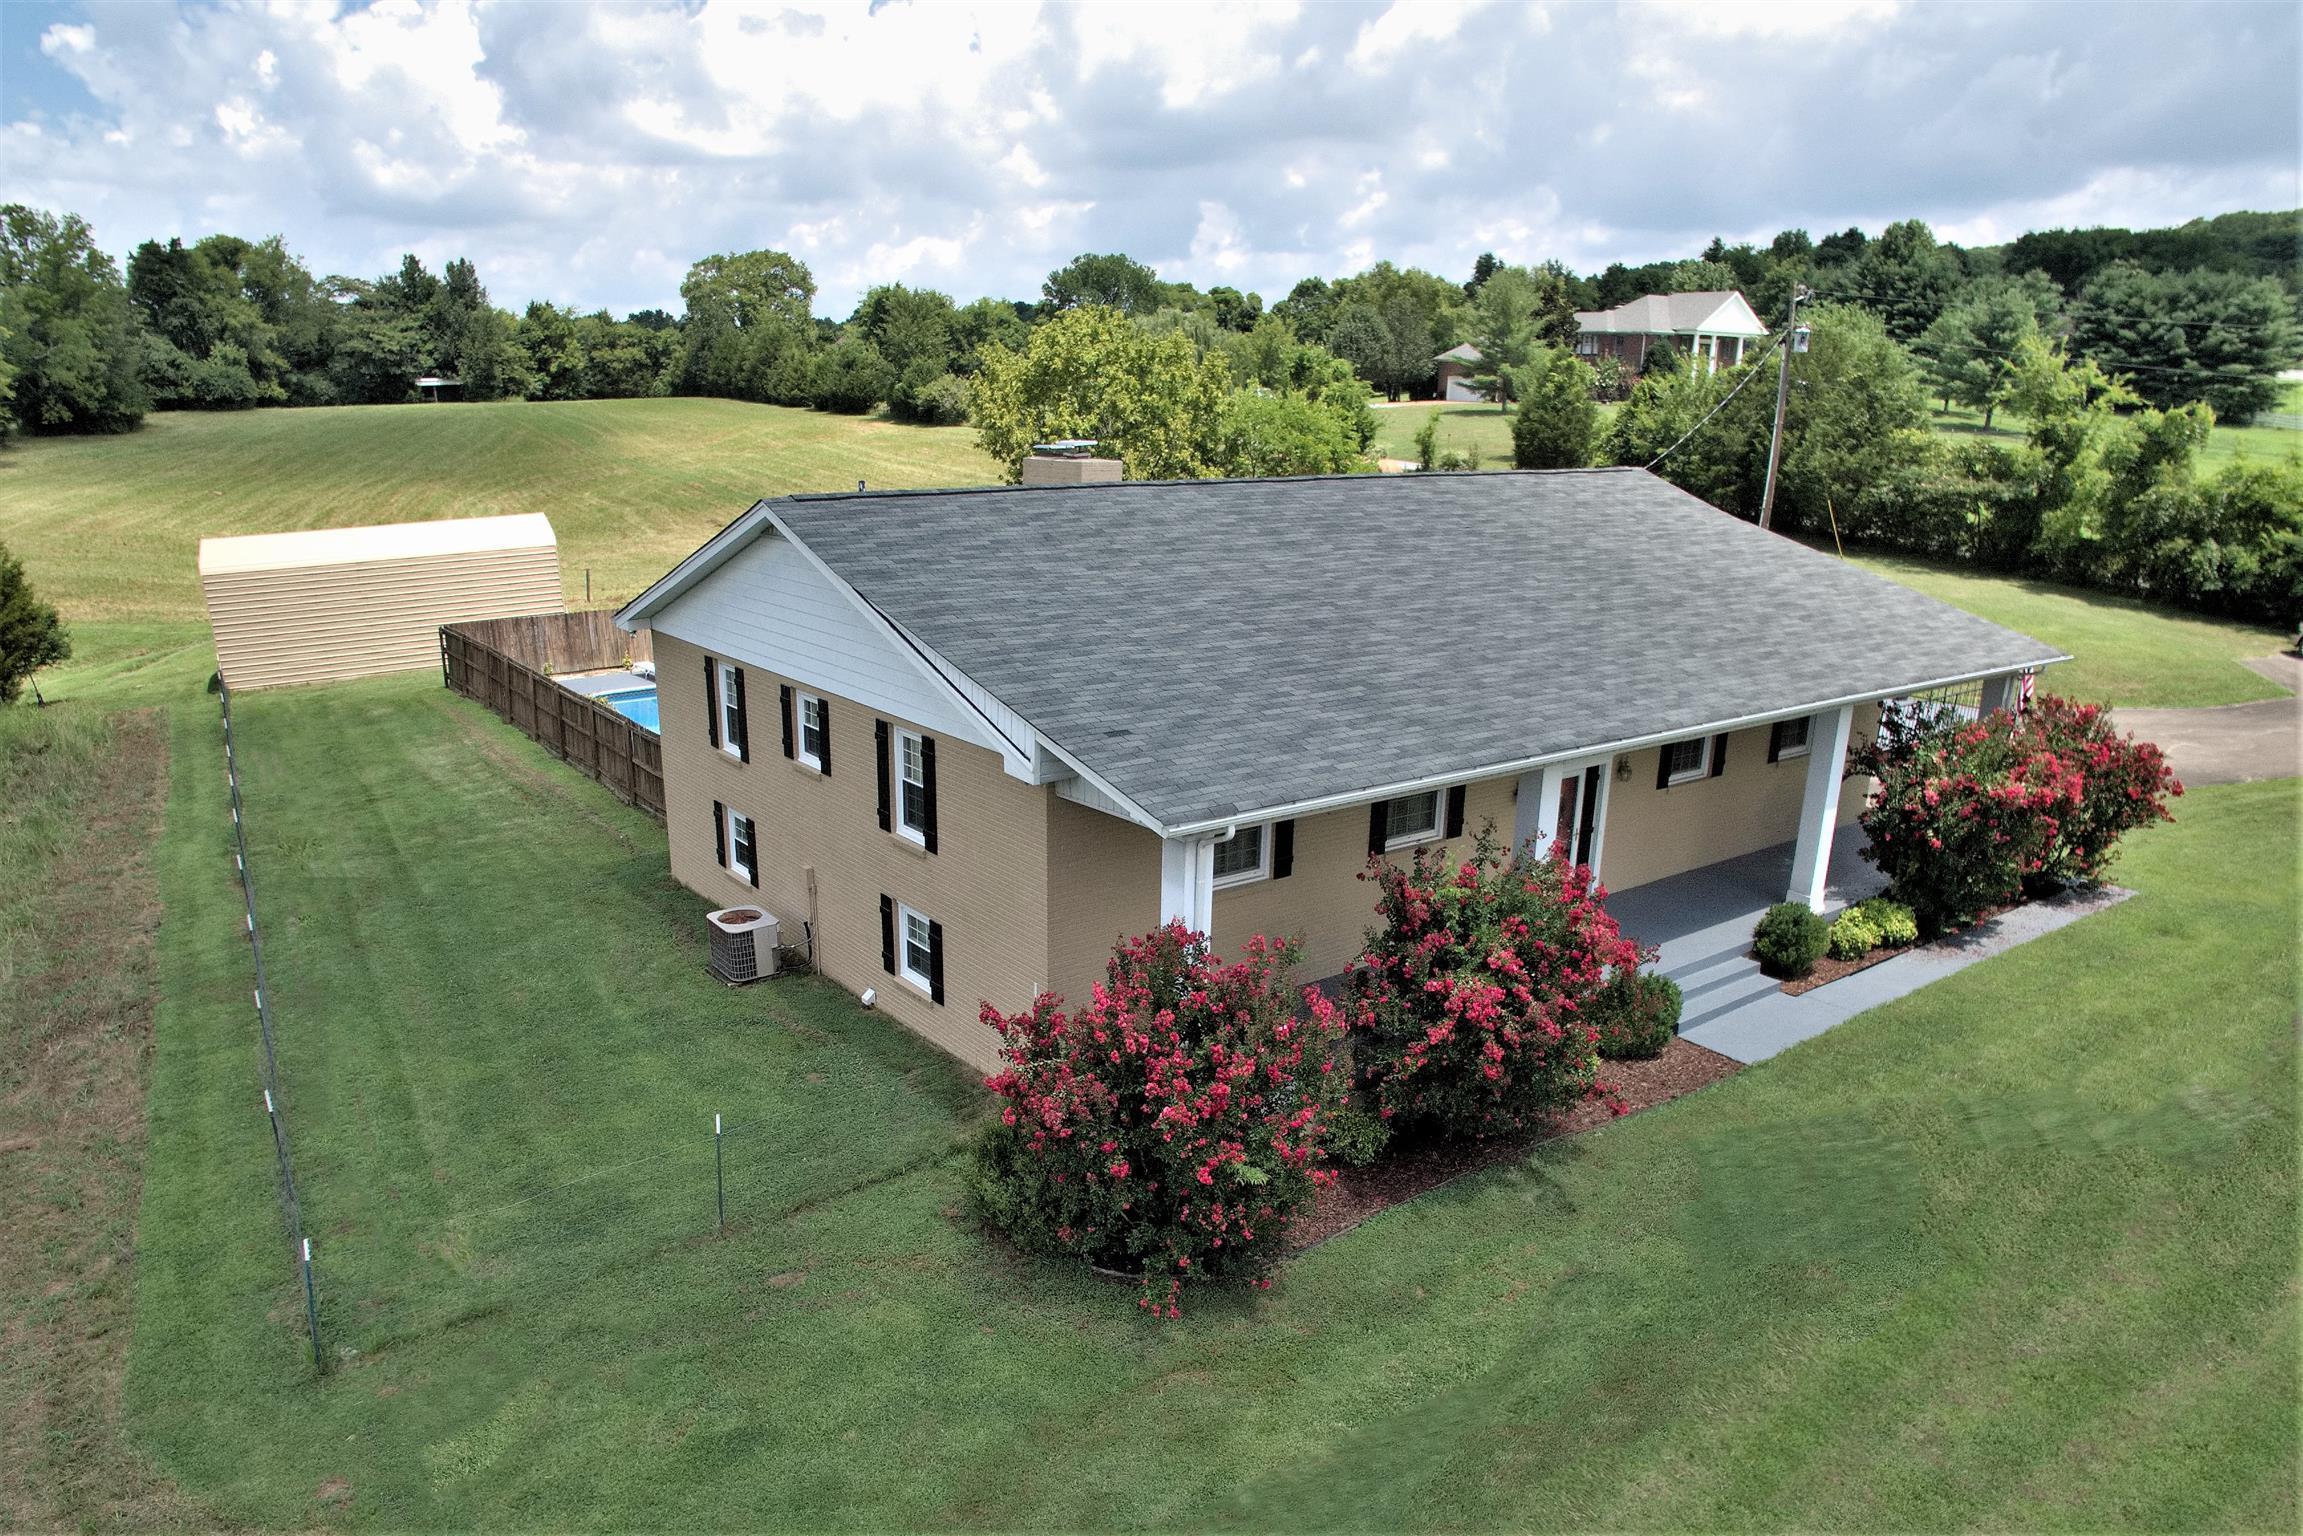 4765 Hickory Ridge Rd, Lebanon, TN 37087 - Lebanon, TN real estate listing